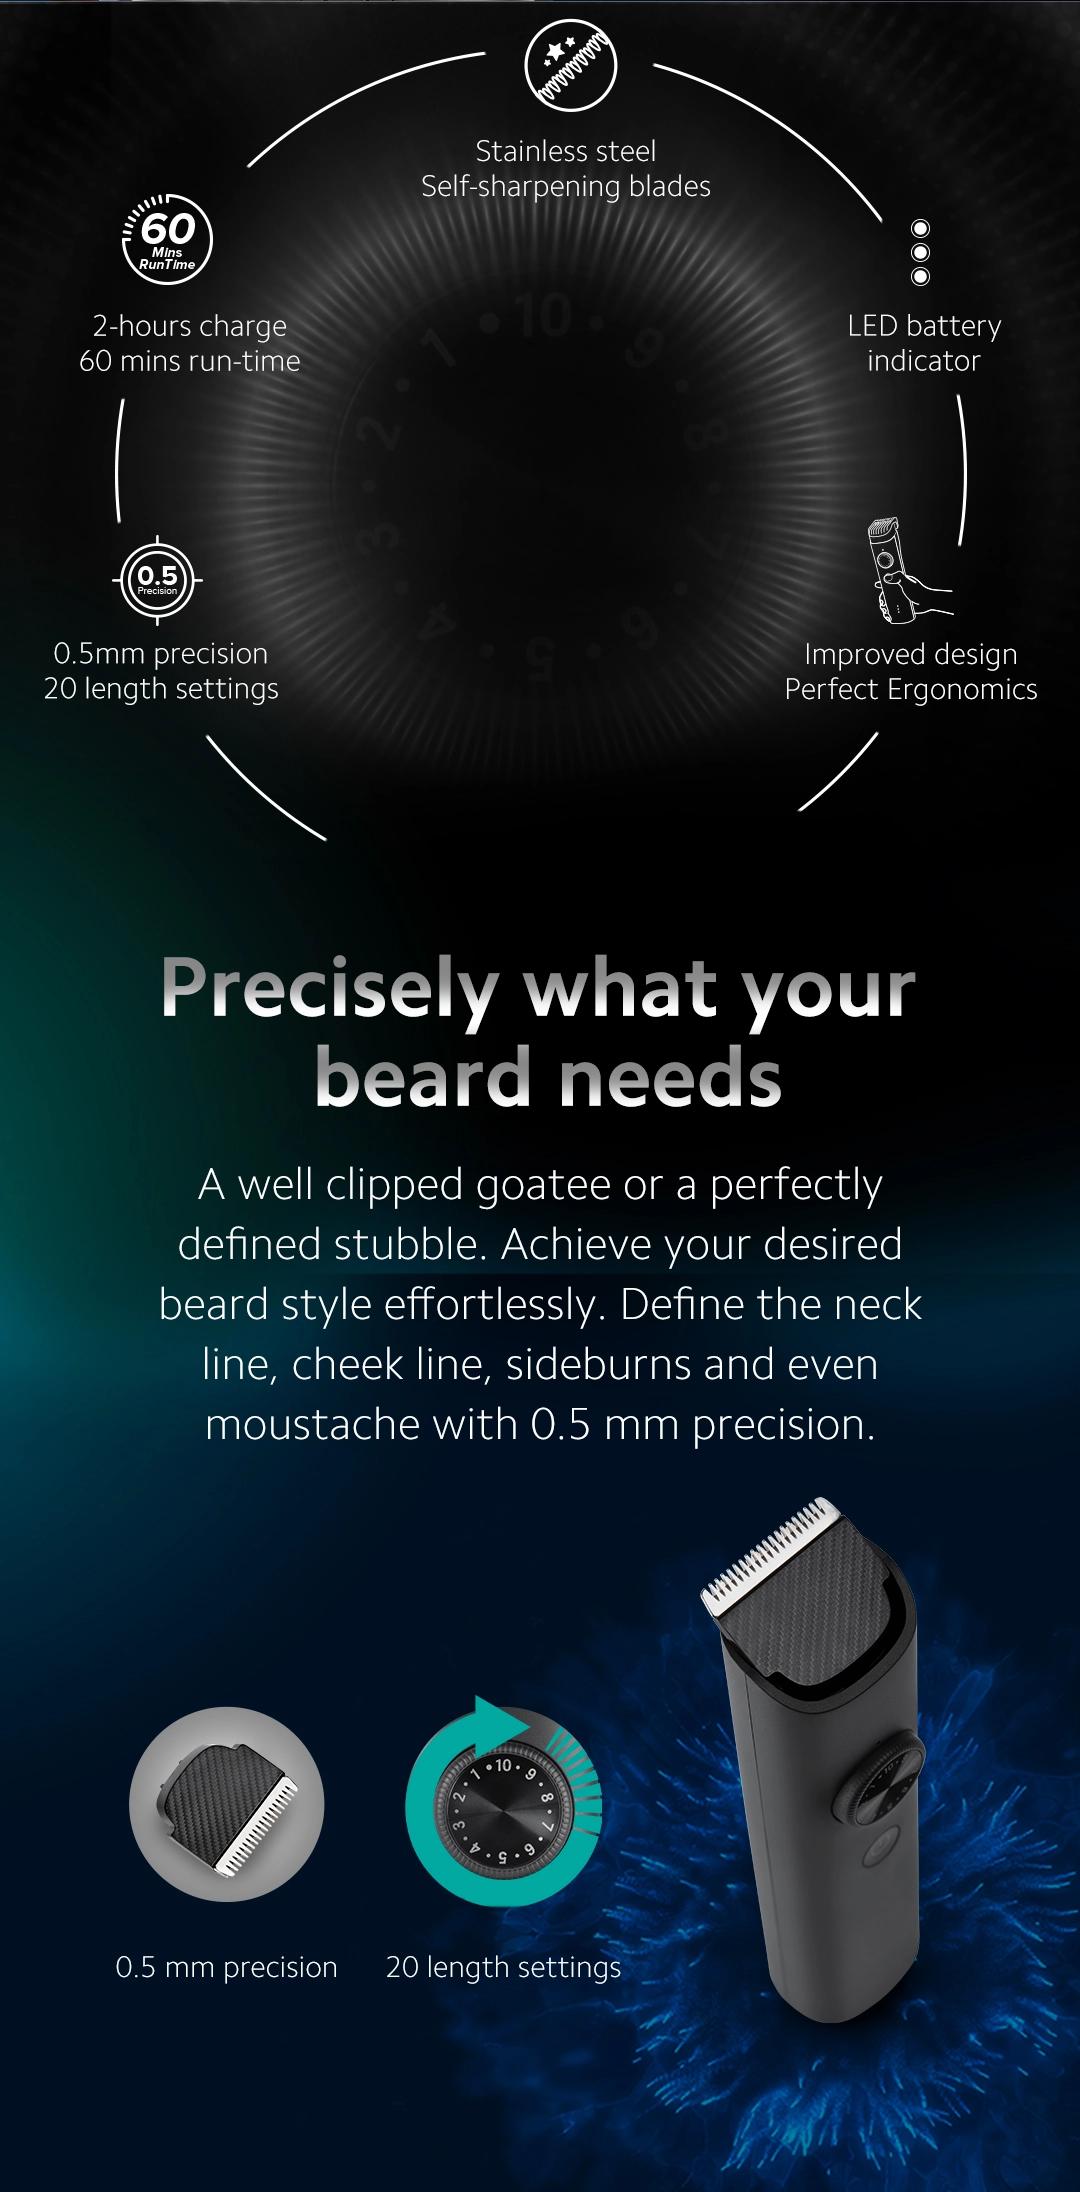 Mi beard trimmer 1c price